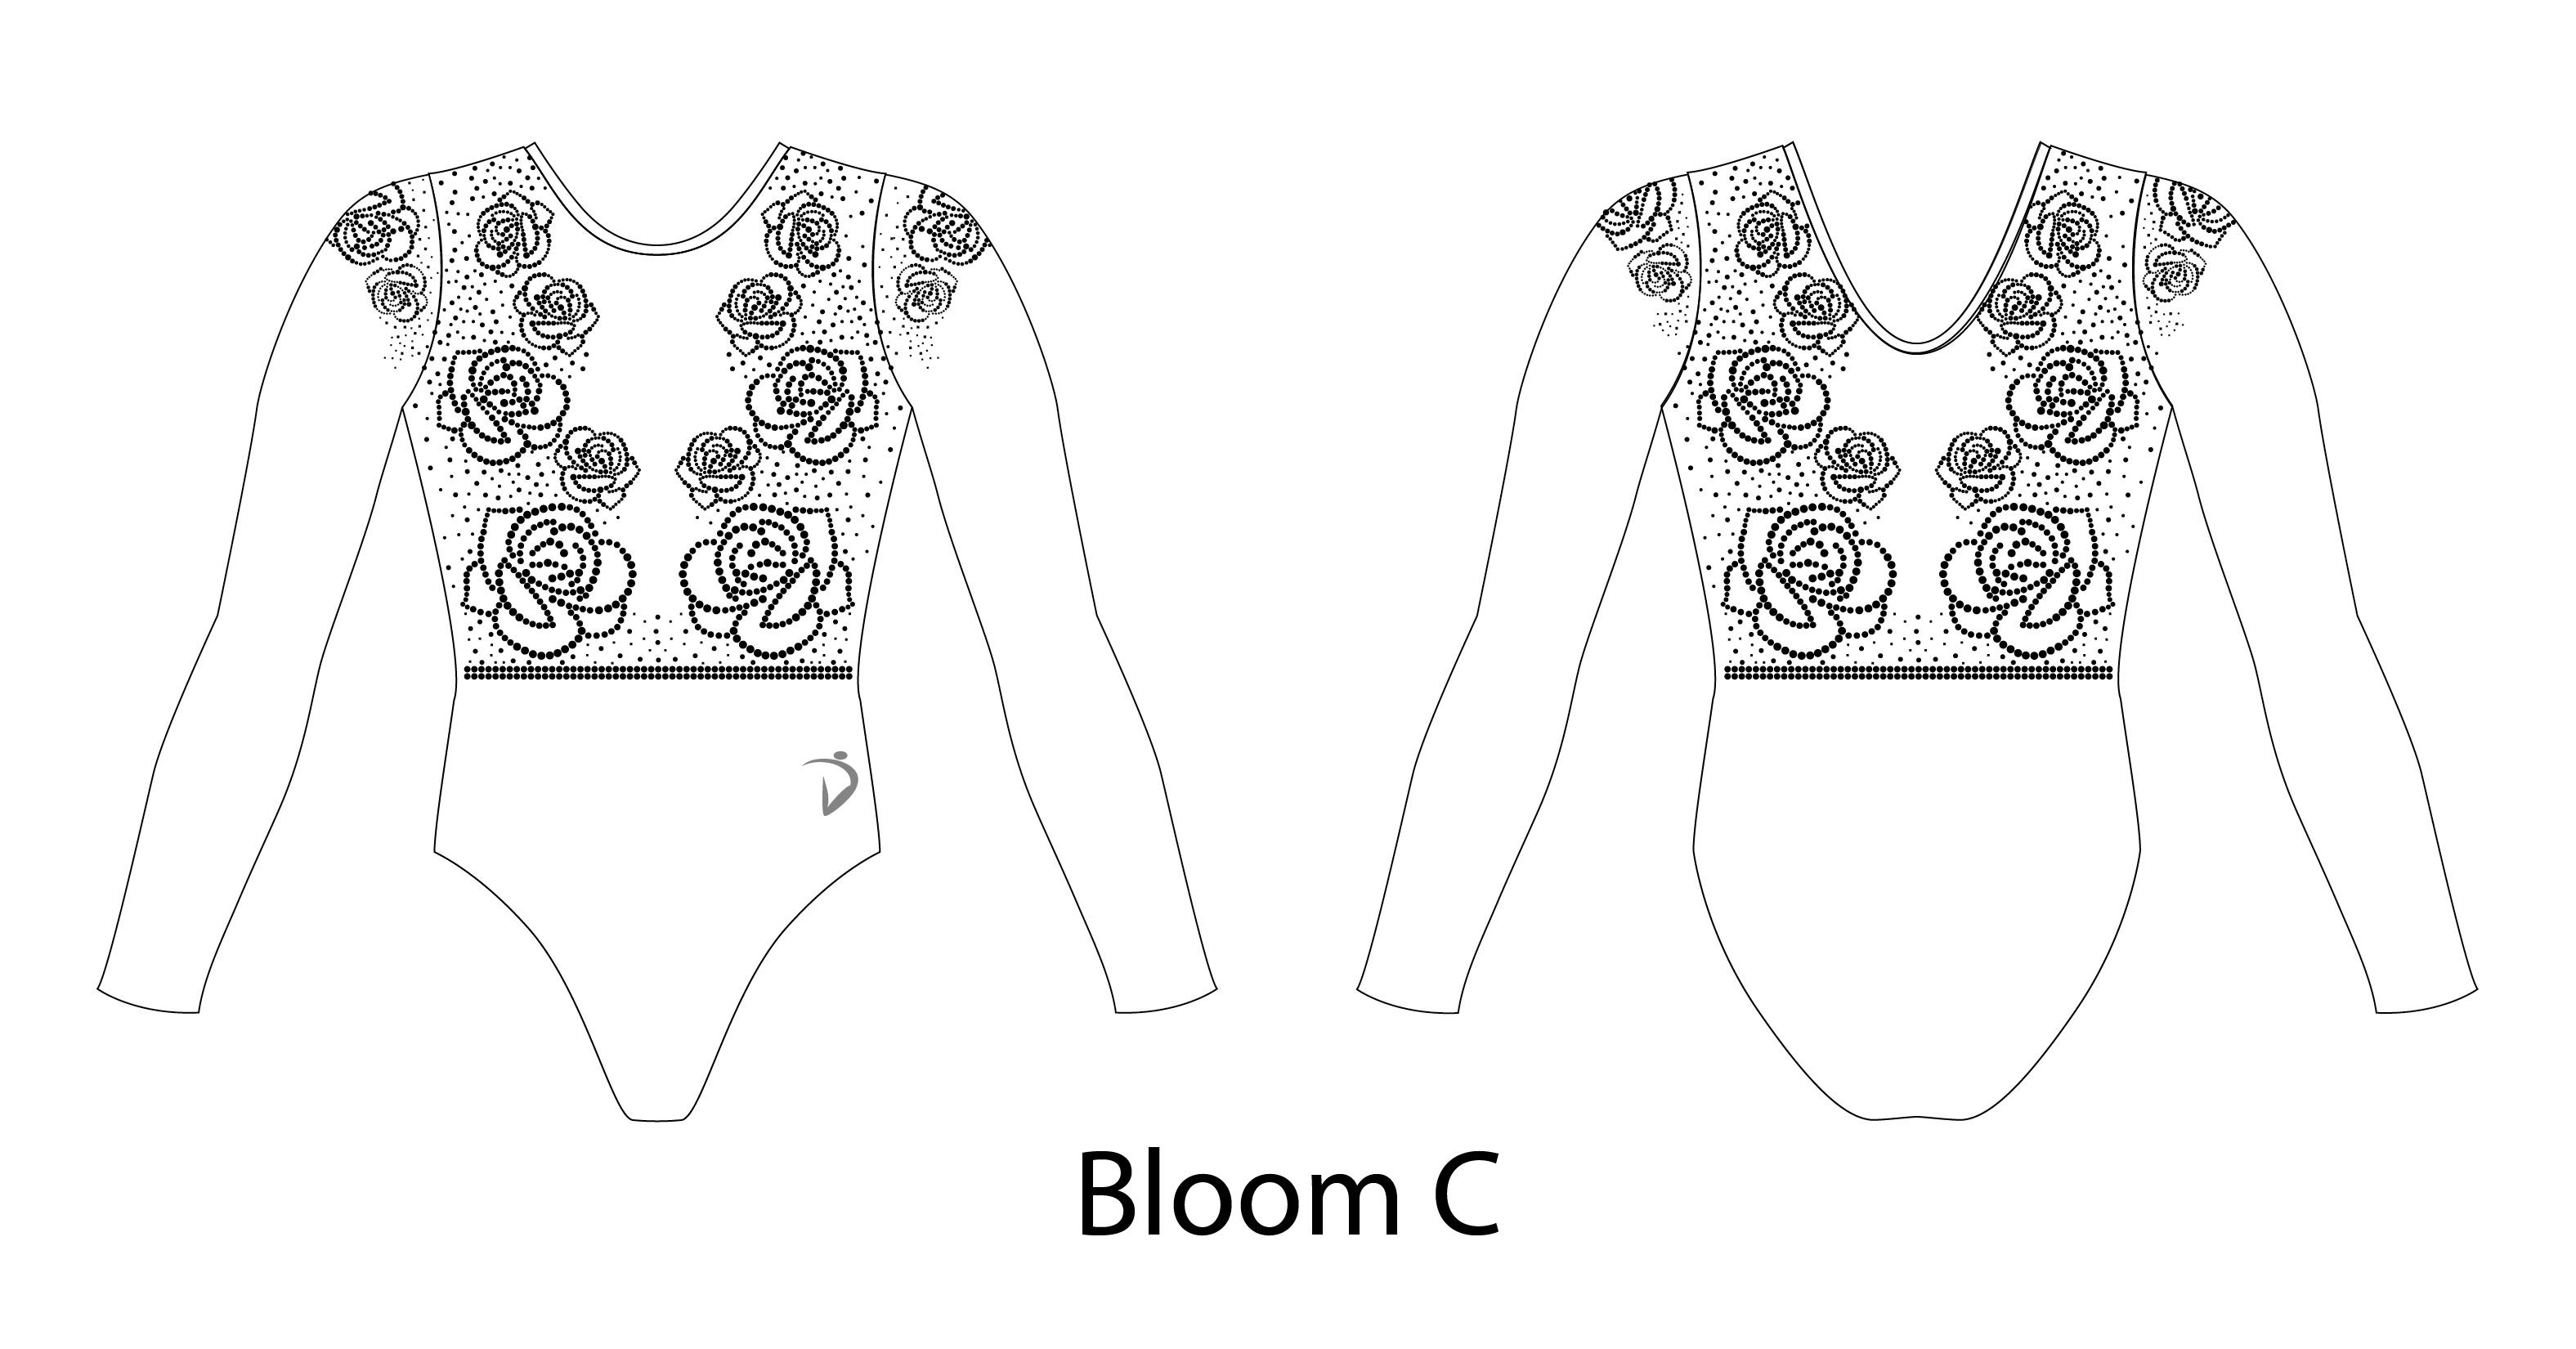 Bloom C